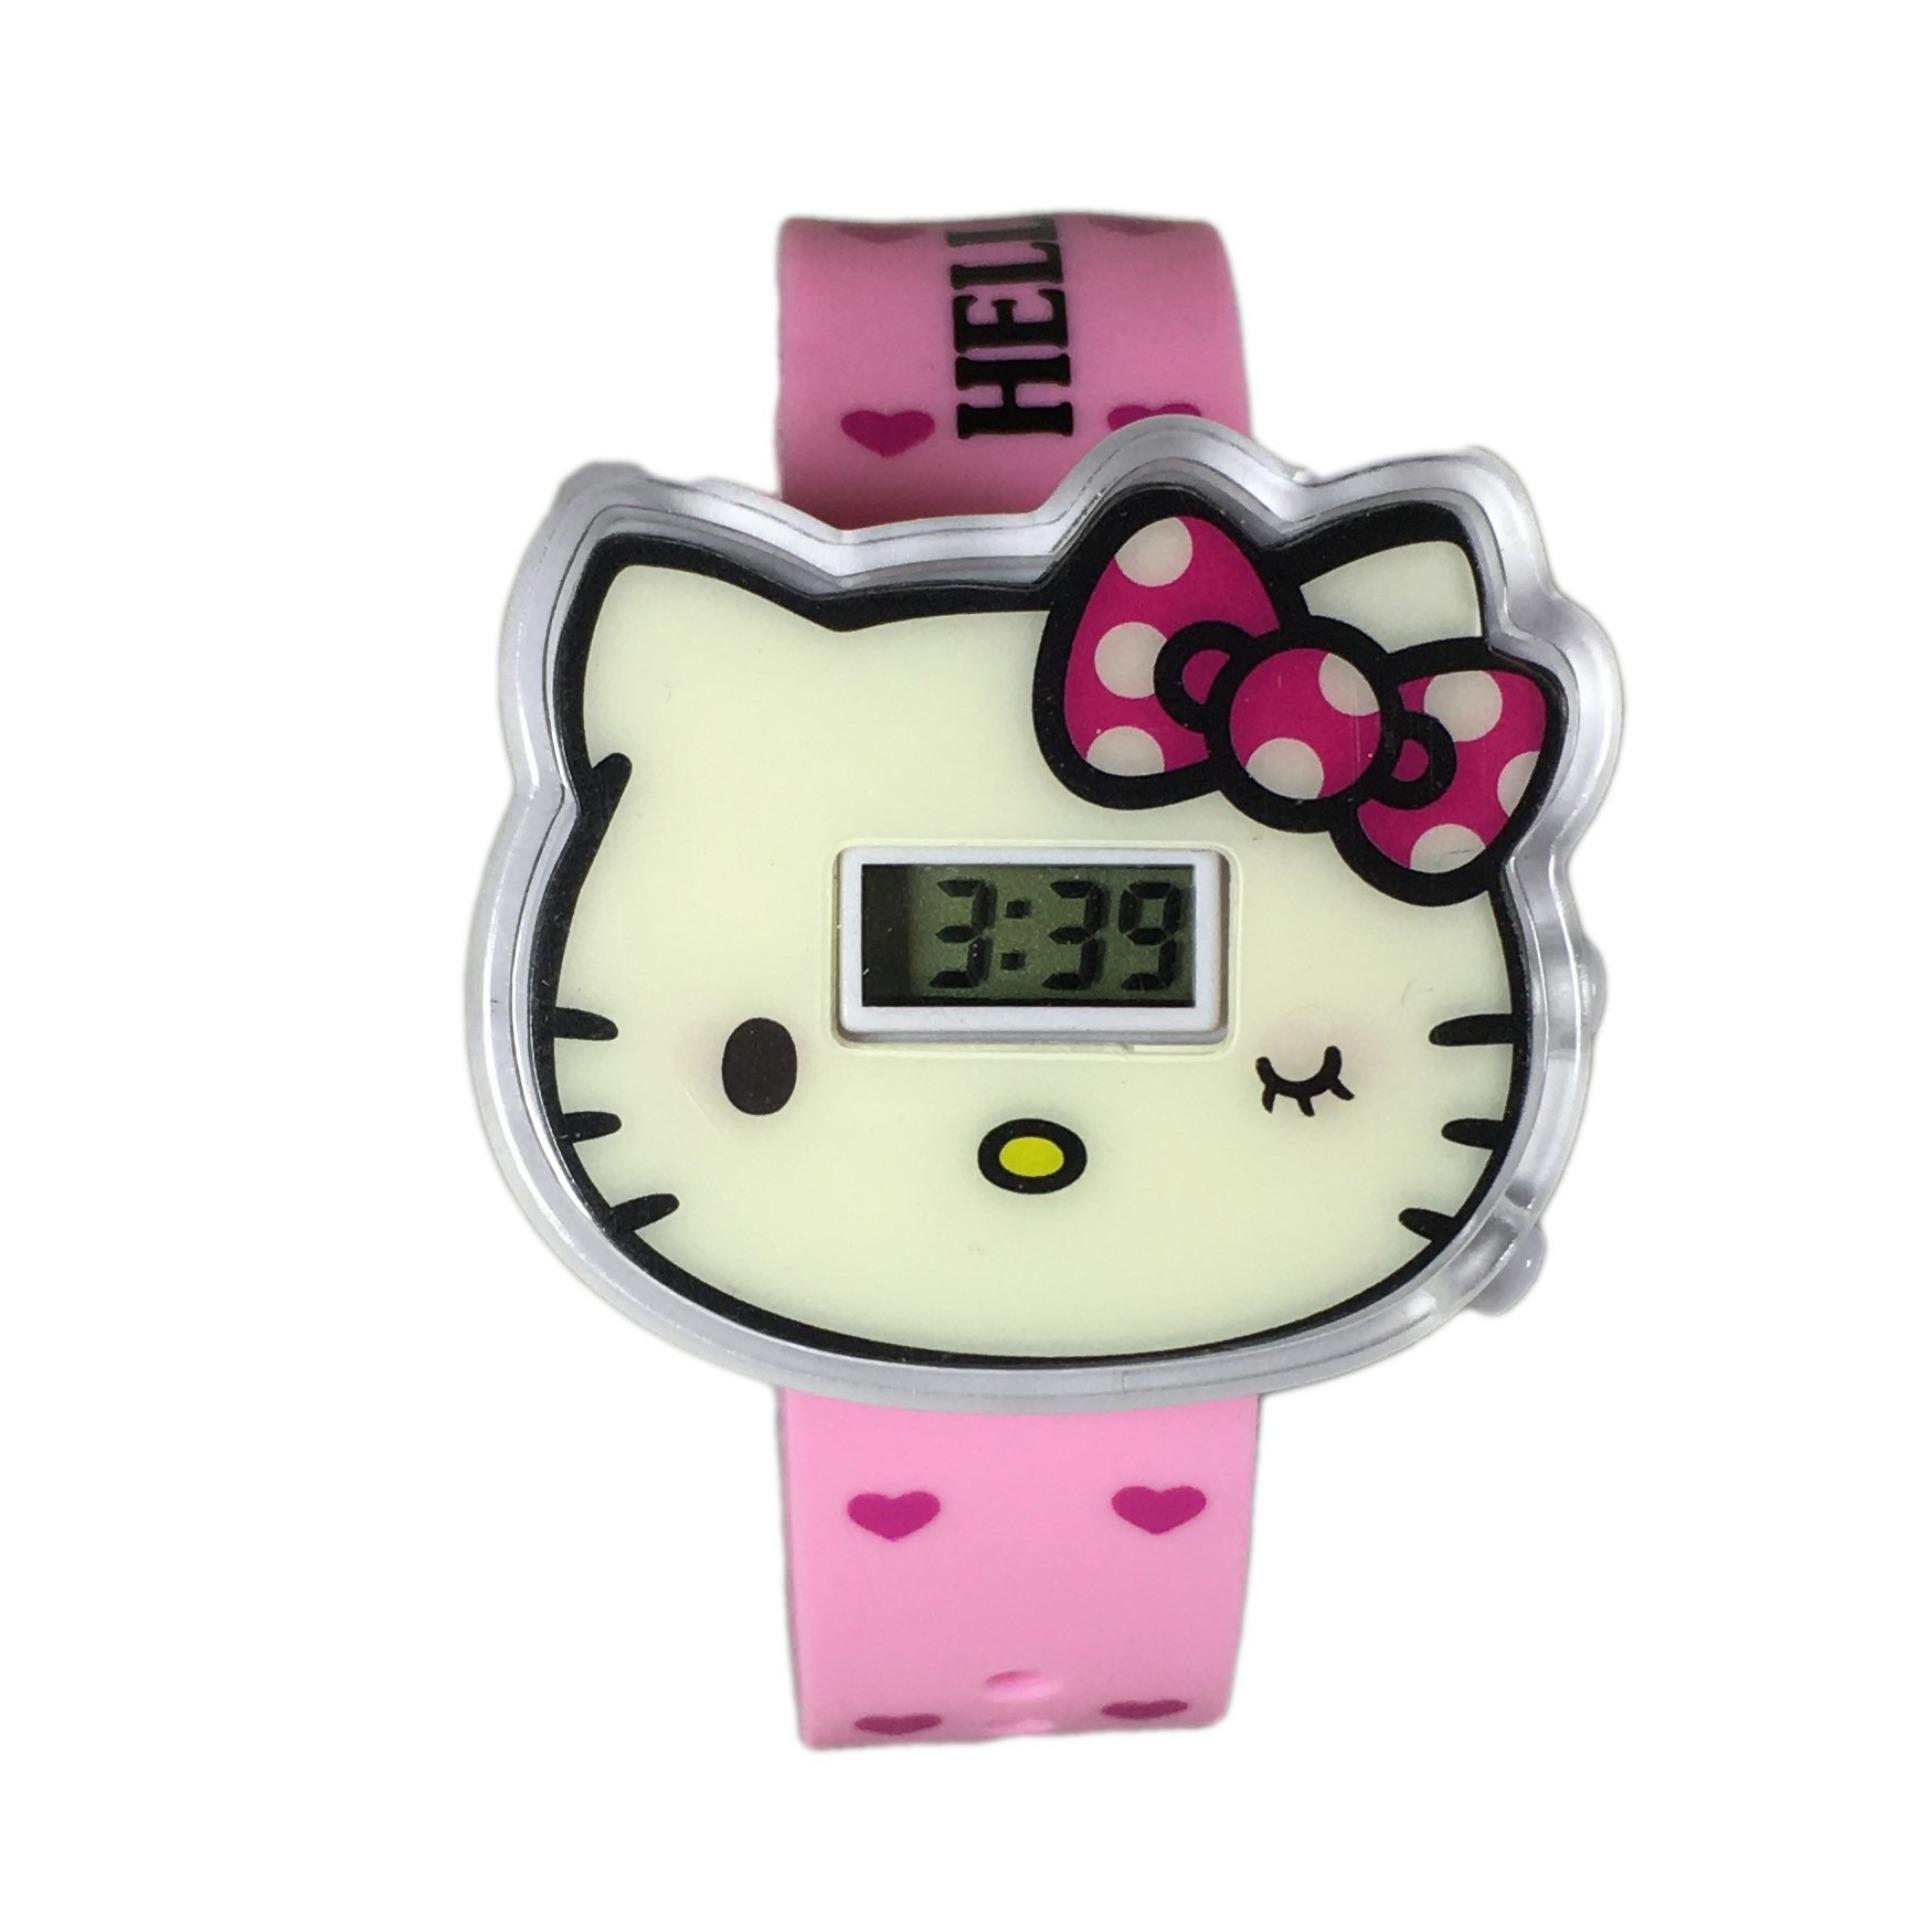 Kehebatan Dnb Collection Jam Tangan Digital Robot Cars Dan Harga Anak Thomas Cover Hello Kitty Light Pink